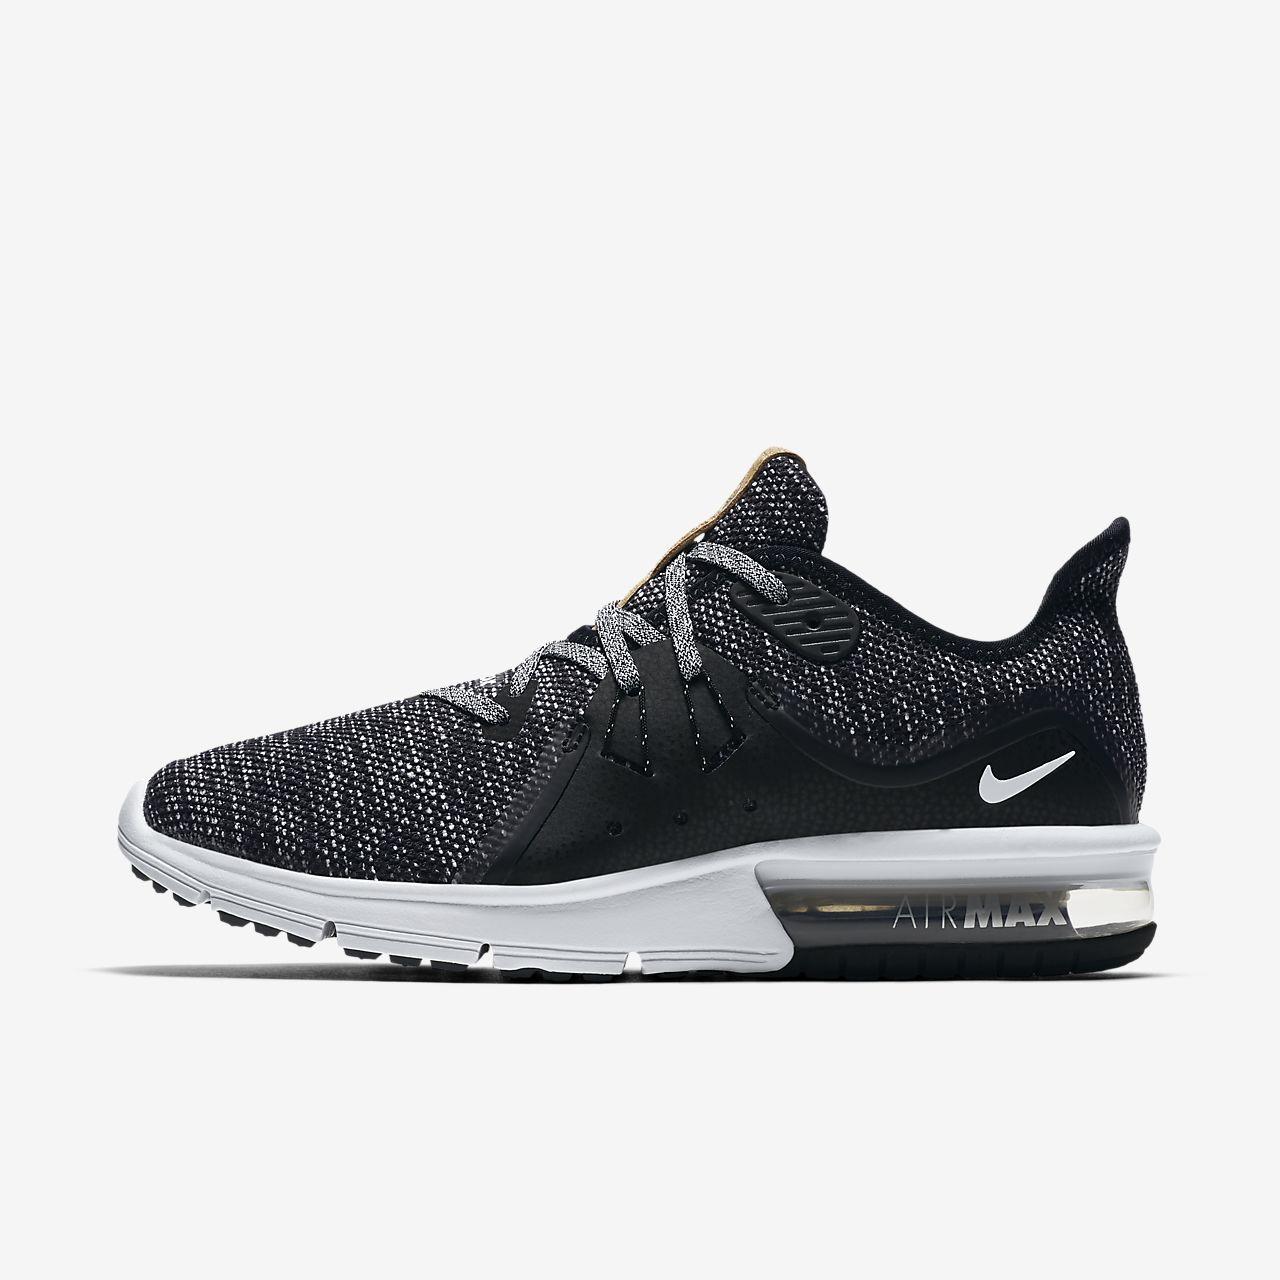 Nike Air Max Sequent 3 Dark Grey Black 908993 013 Women